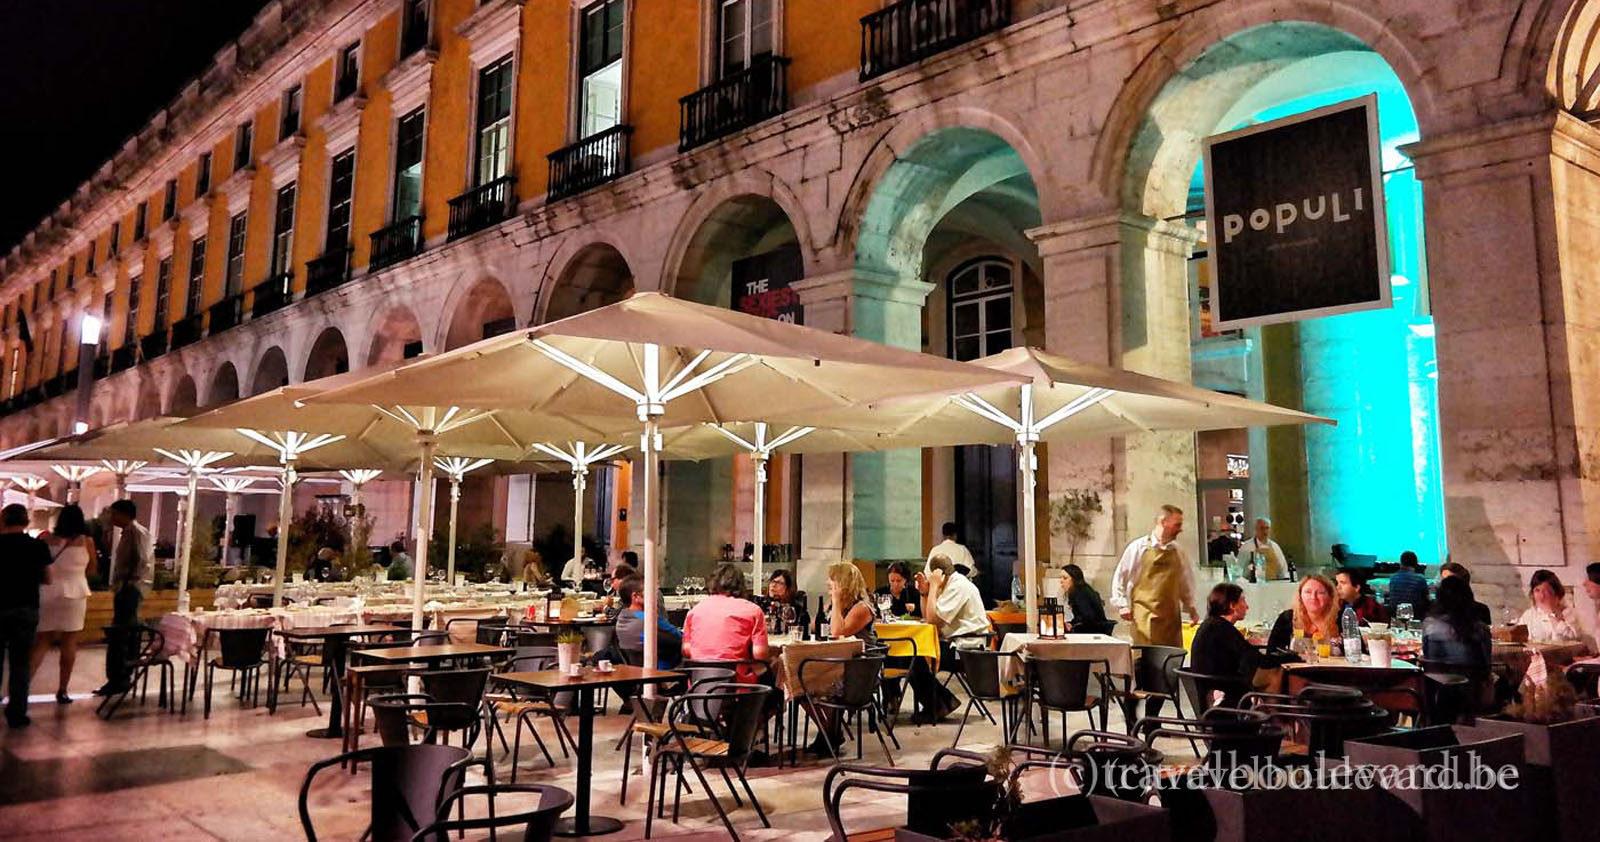 Lisbon restaurant populi